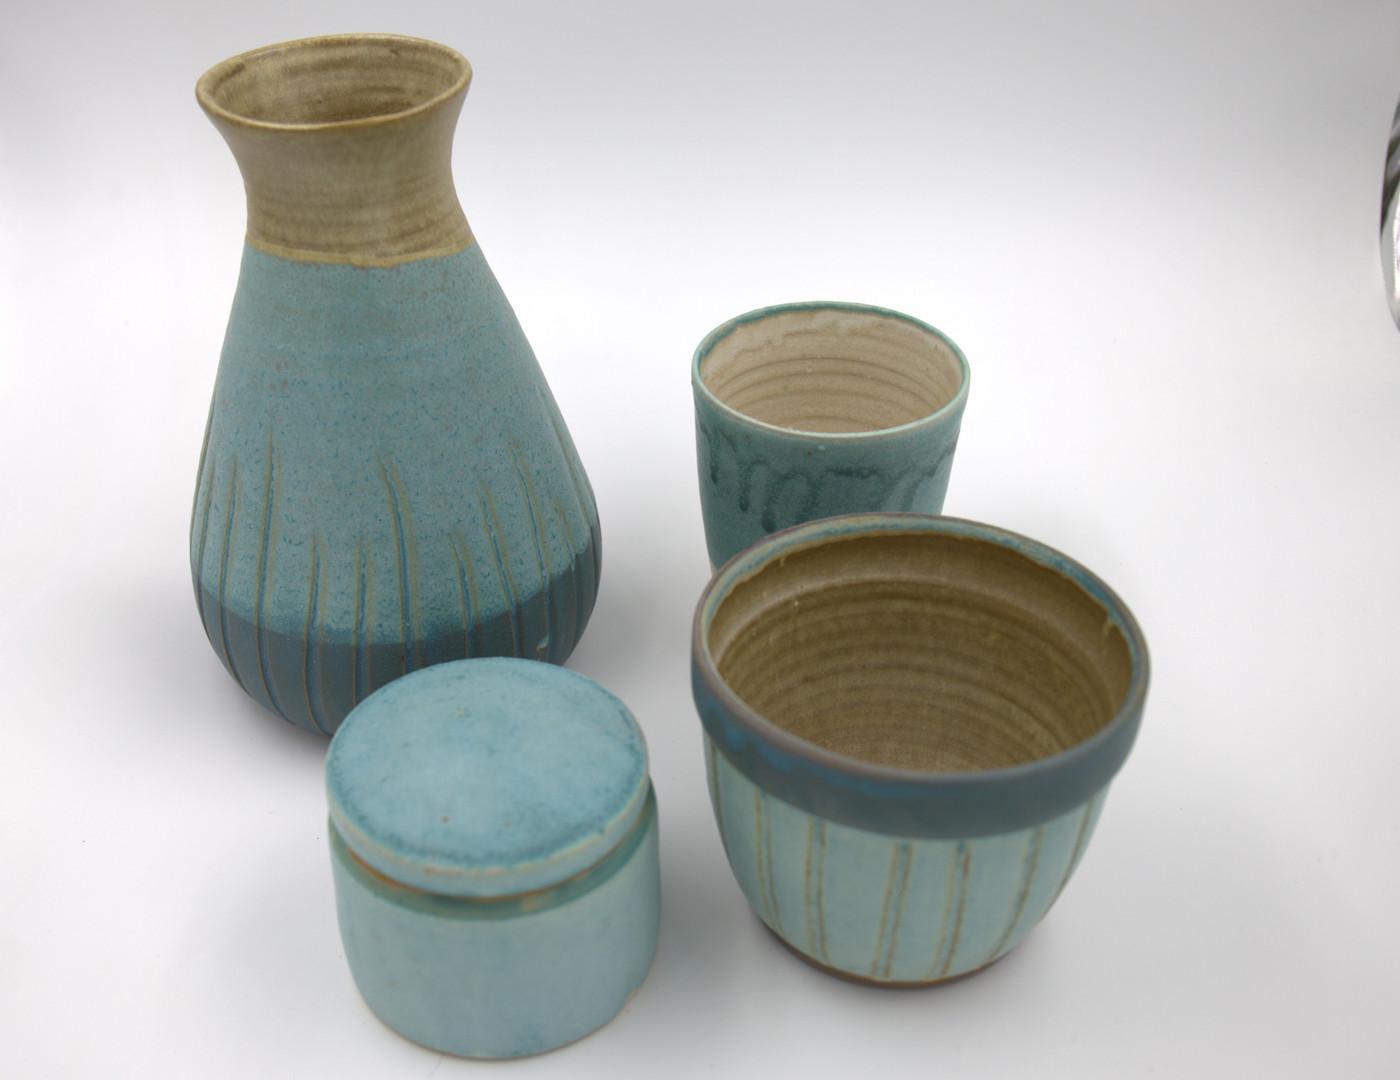 türkise Serie: große Vase, ca. 23cm hoch: 55,-, Dose 35,-, Blumentopf: 25,-, Becher, ca. 1/4l: 17,-